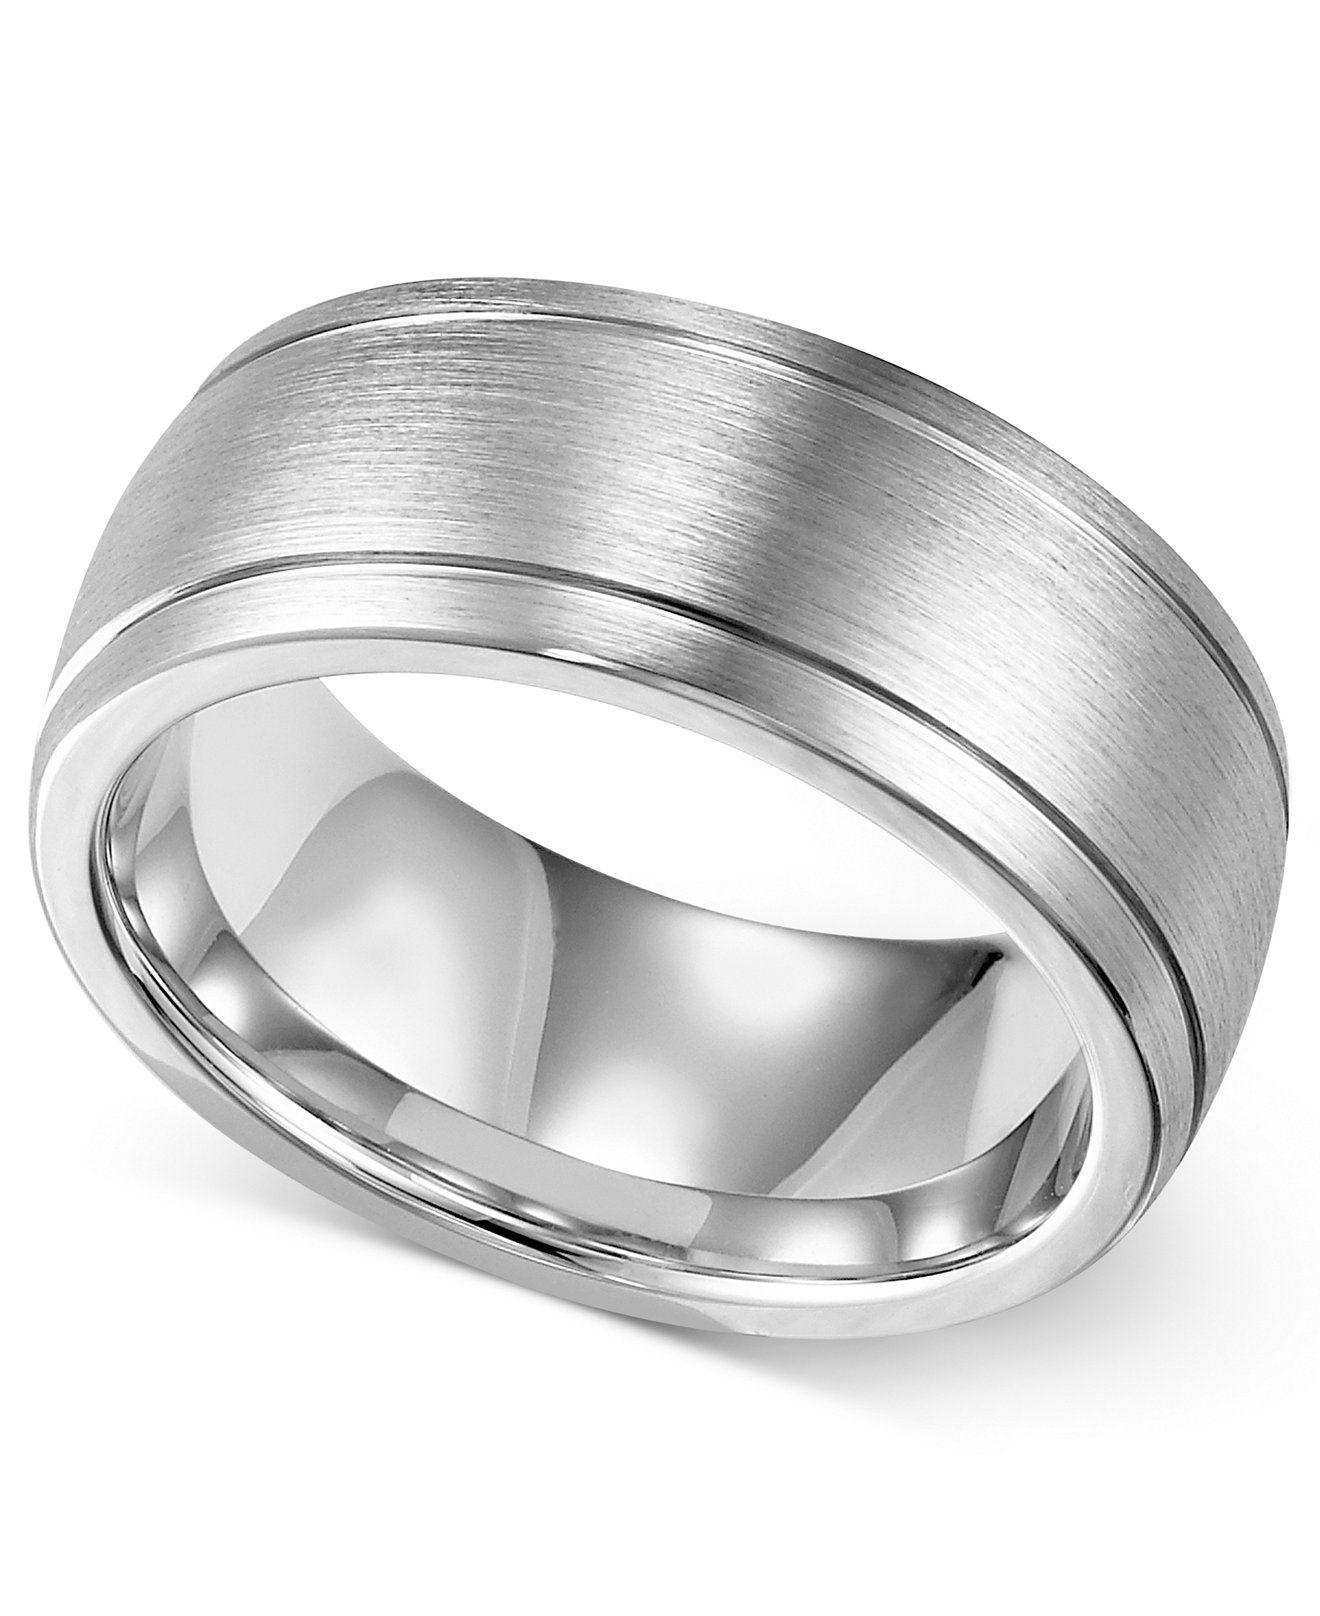 Macys Mens Wedding Rings: Triton Men's Cobalt Ring, 8mm Wedding Band